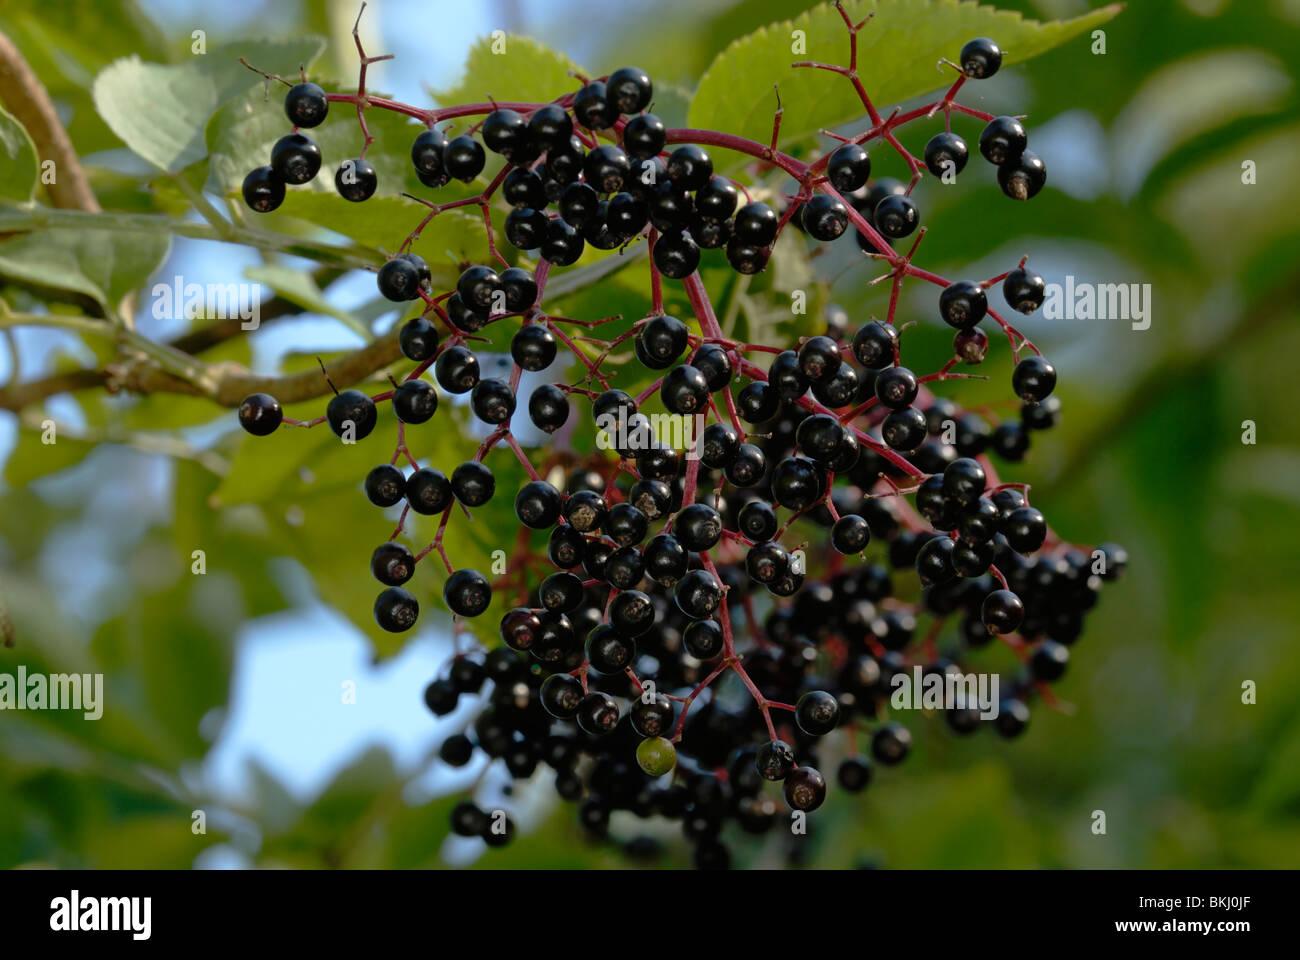 Berries of Elder tree, Sambucus nigra, Wales. - Stock Image